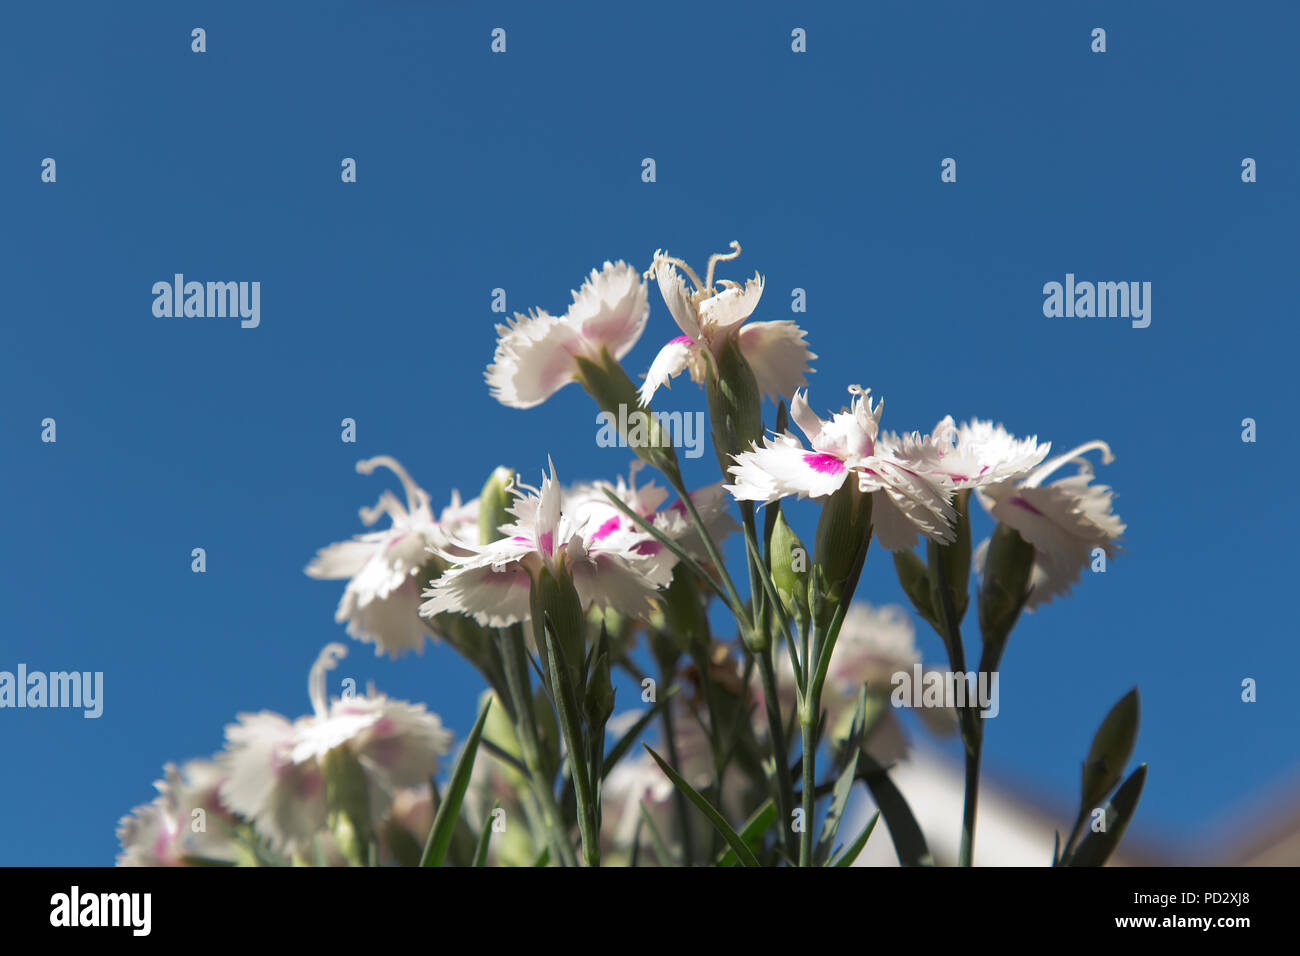 summer flowers in English garden - Stock Image